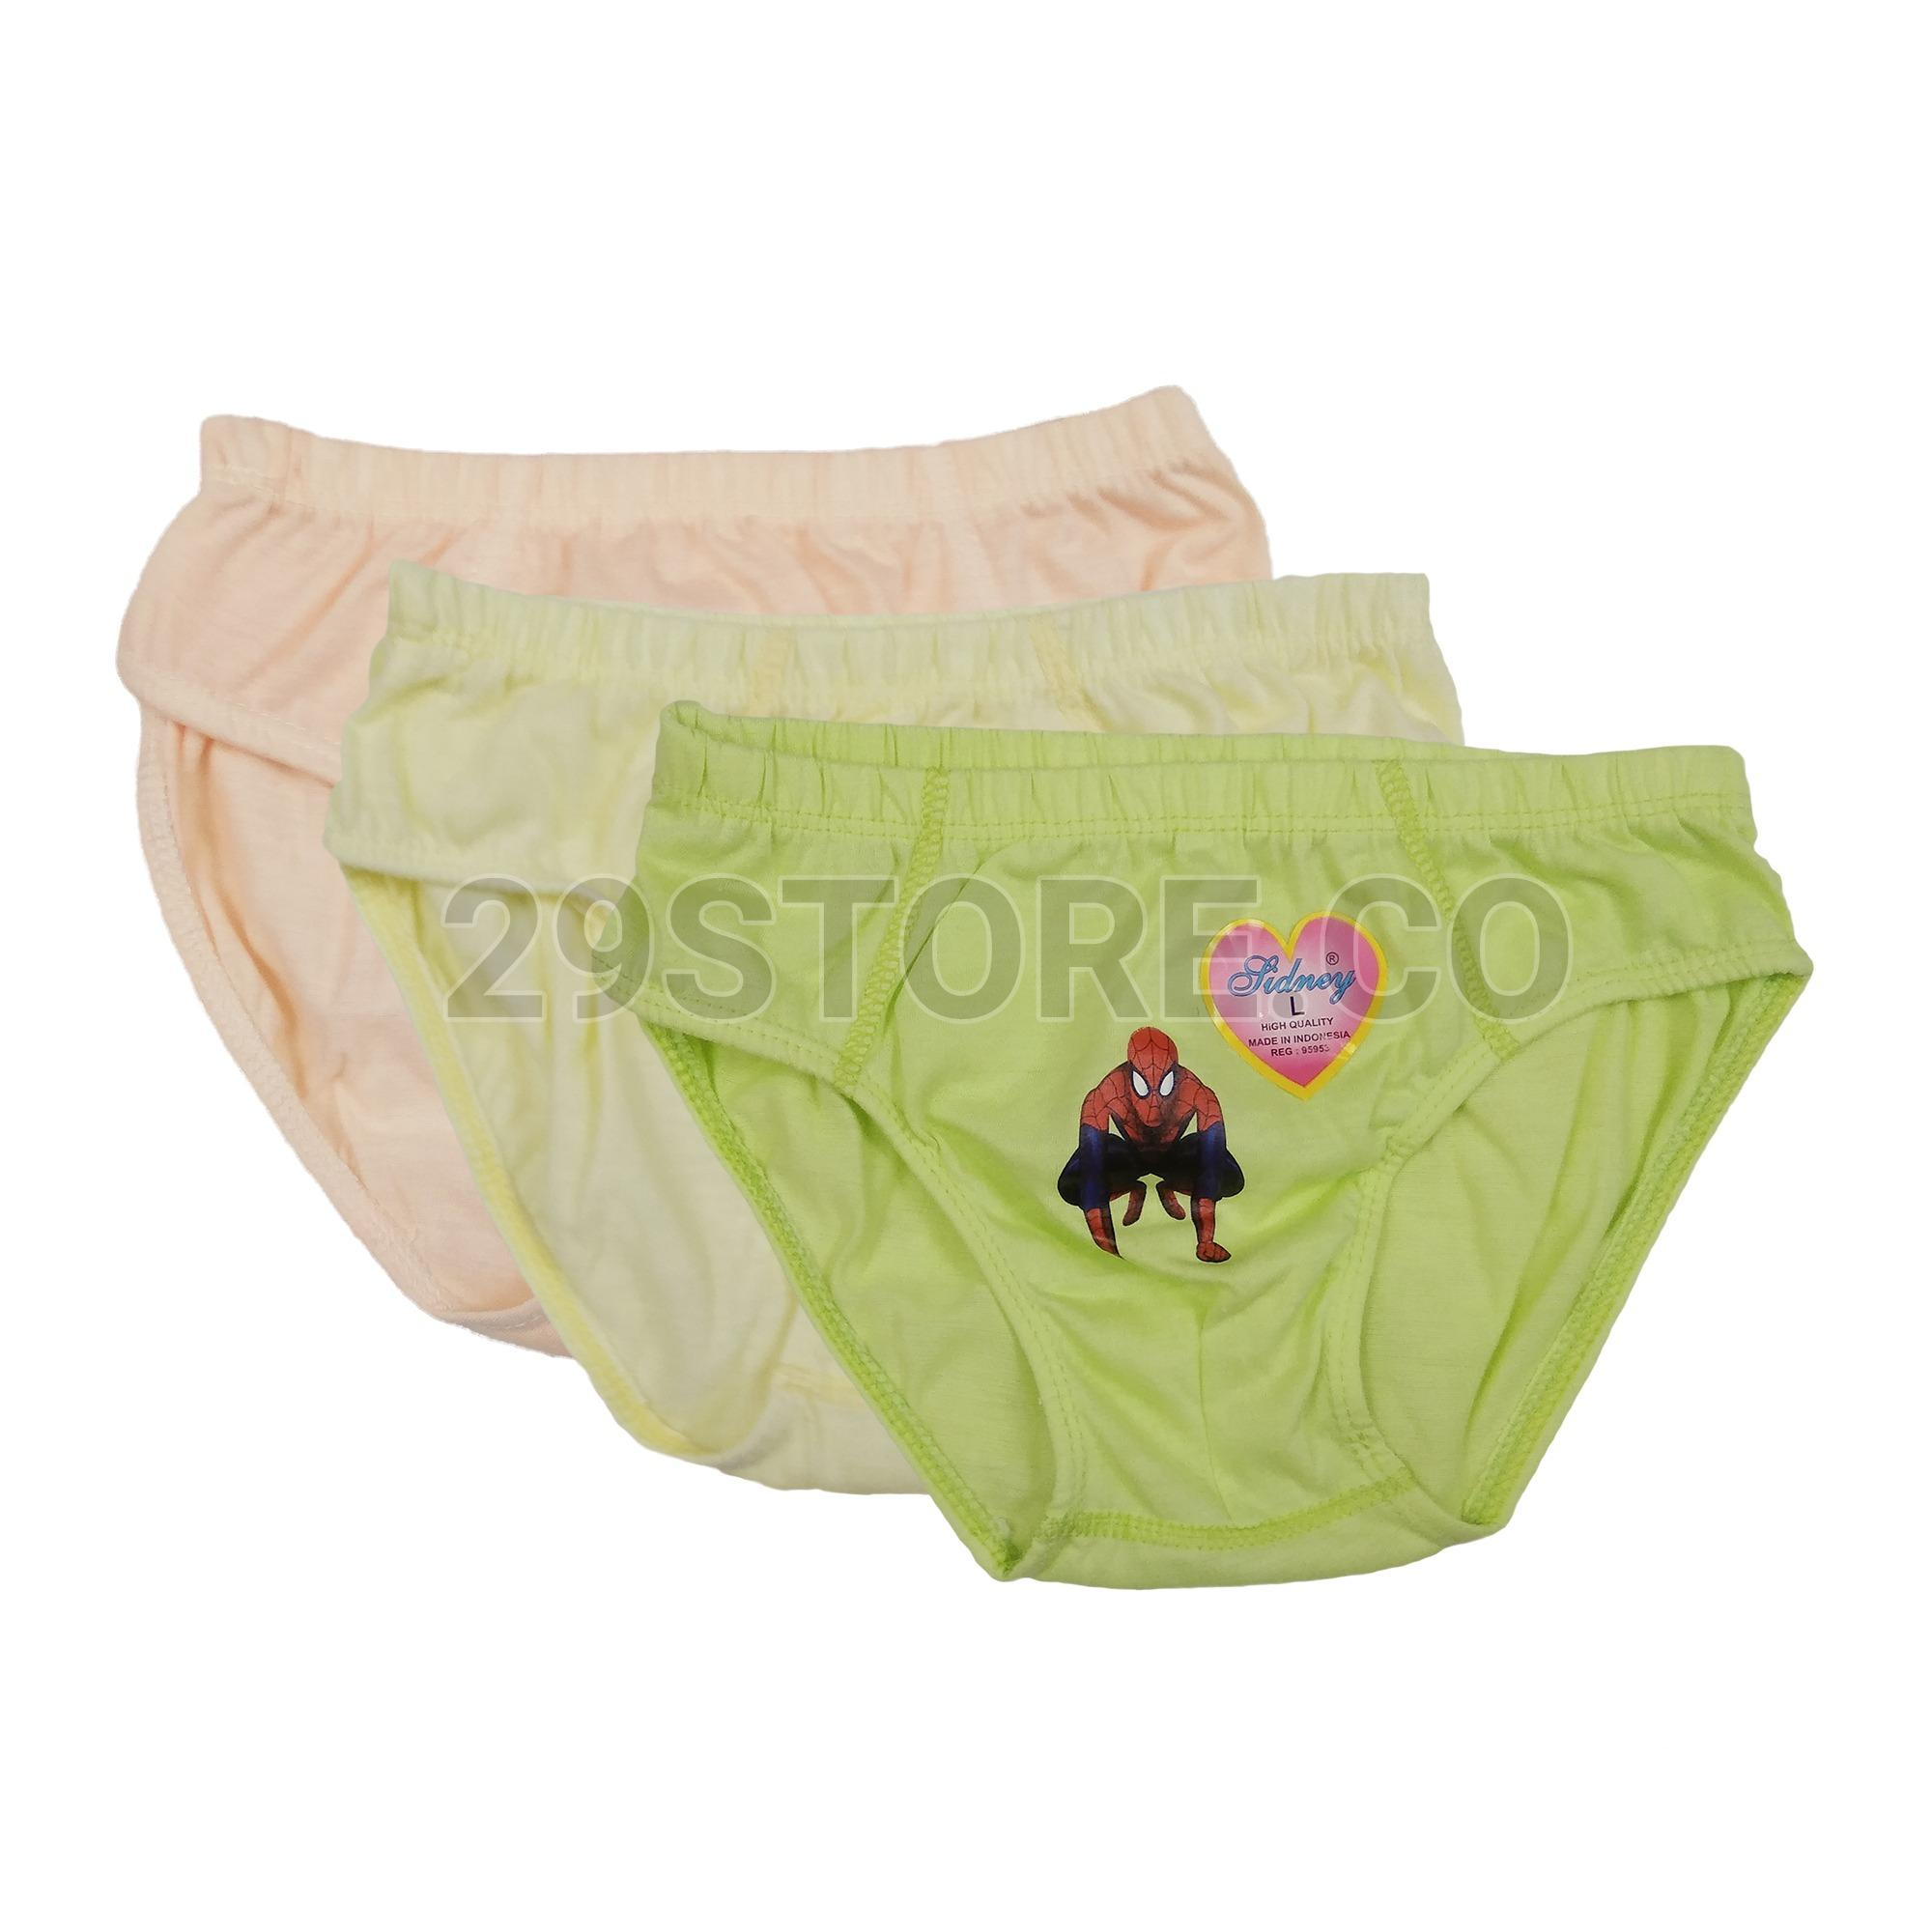 6 Pcs - Celana Dalam CD Anak Cowok Laki-Laki Polos Murah e16e95ddd6